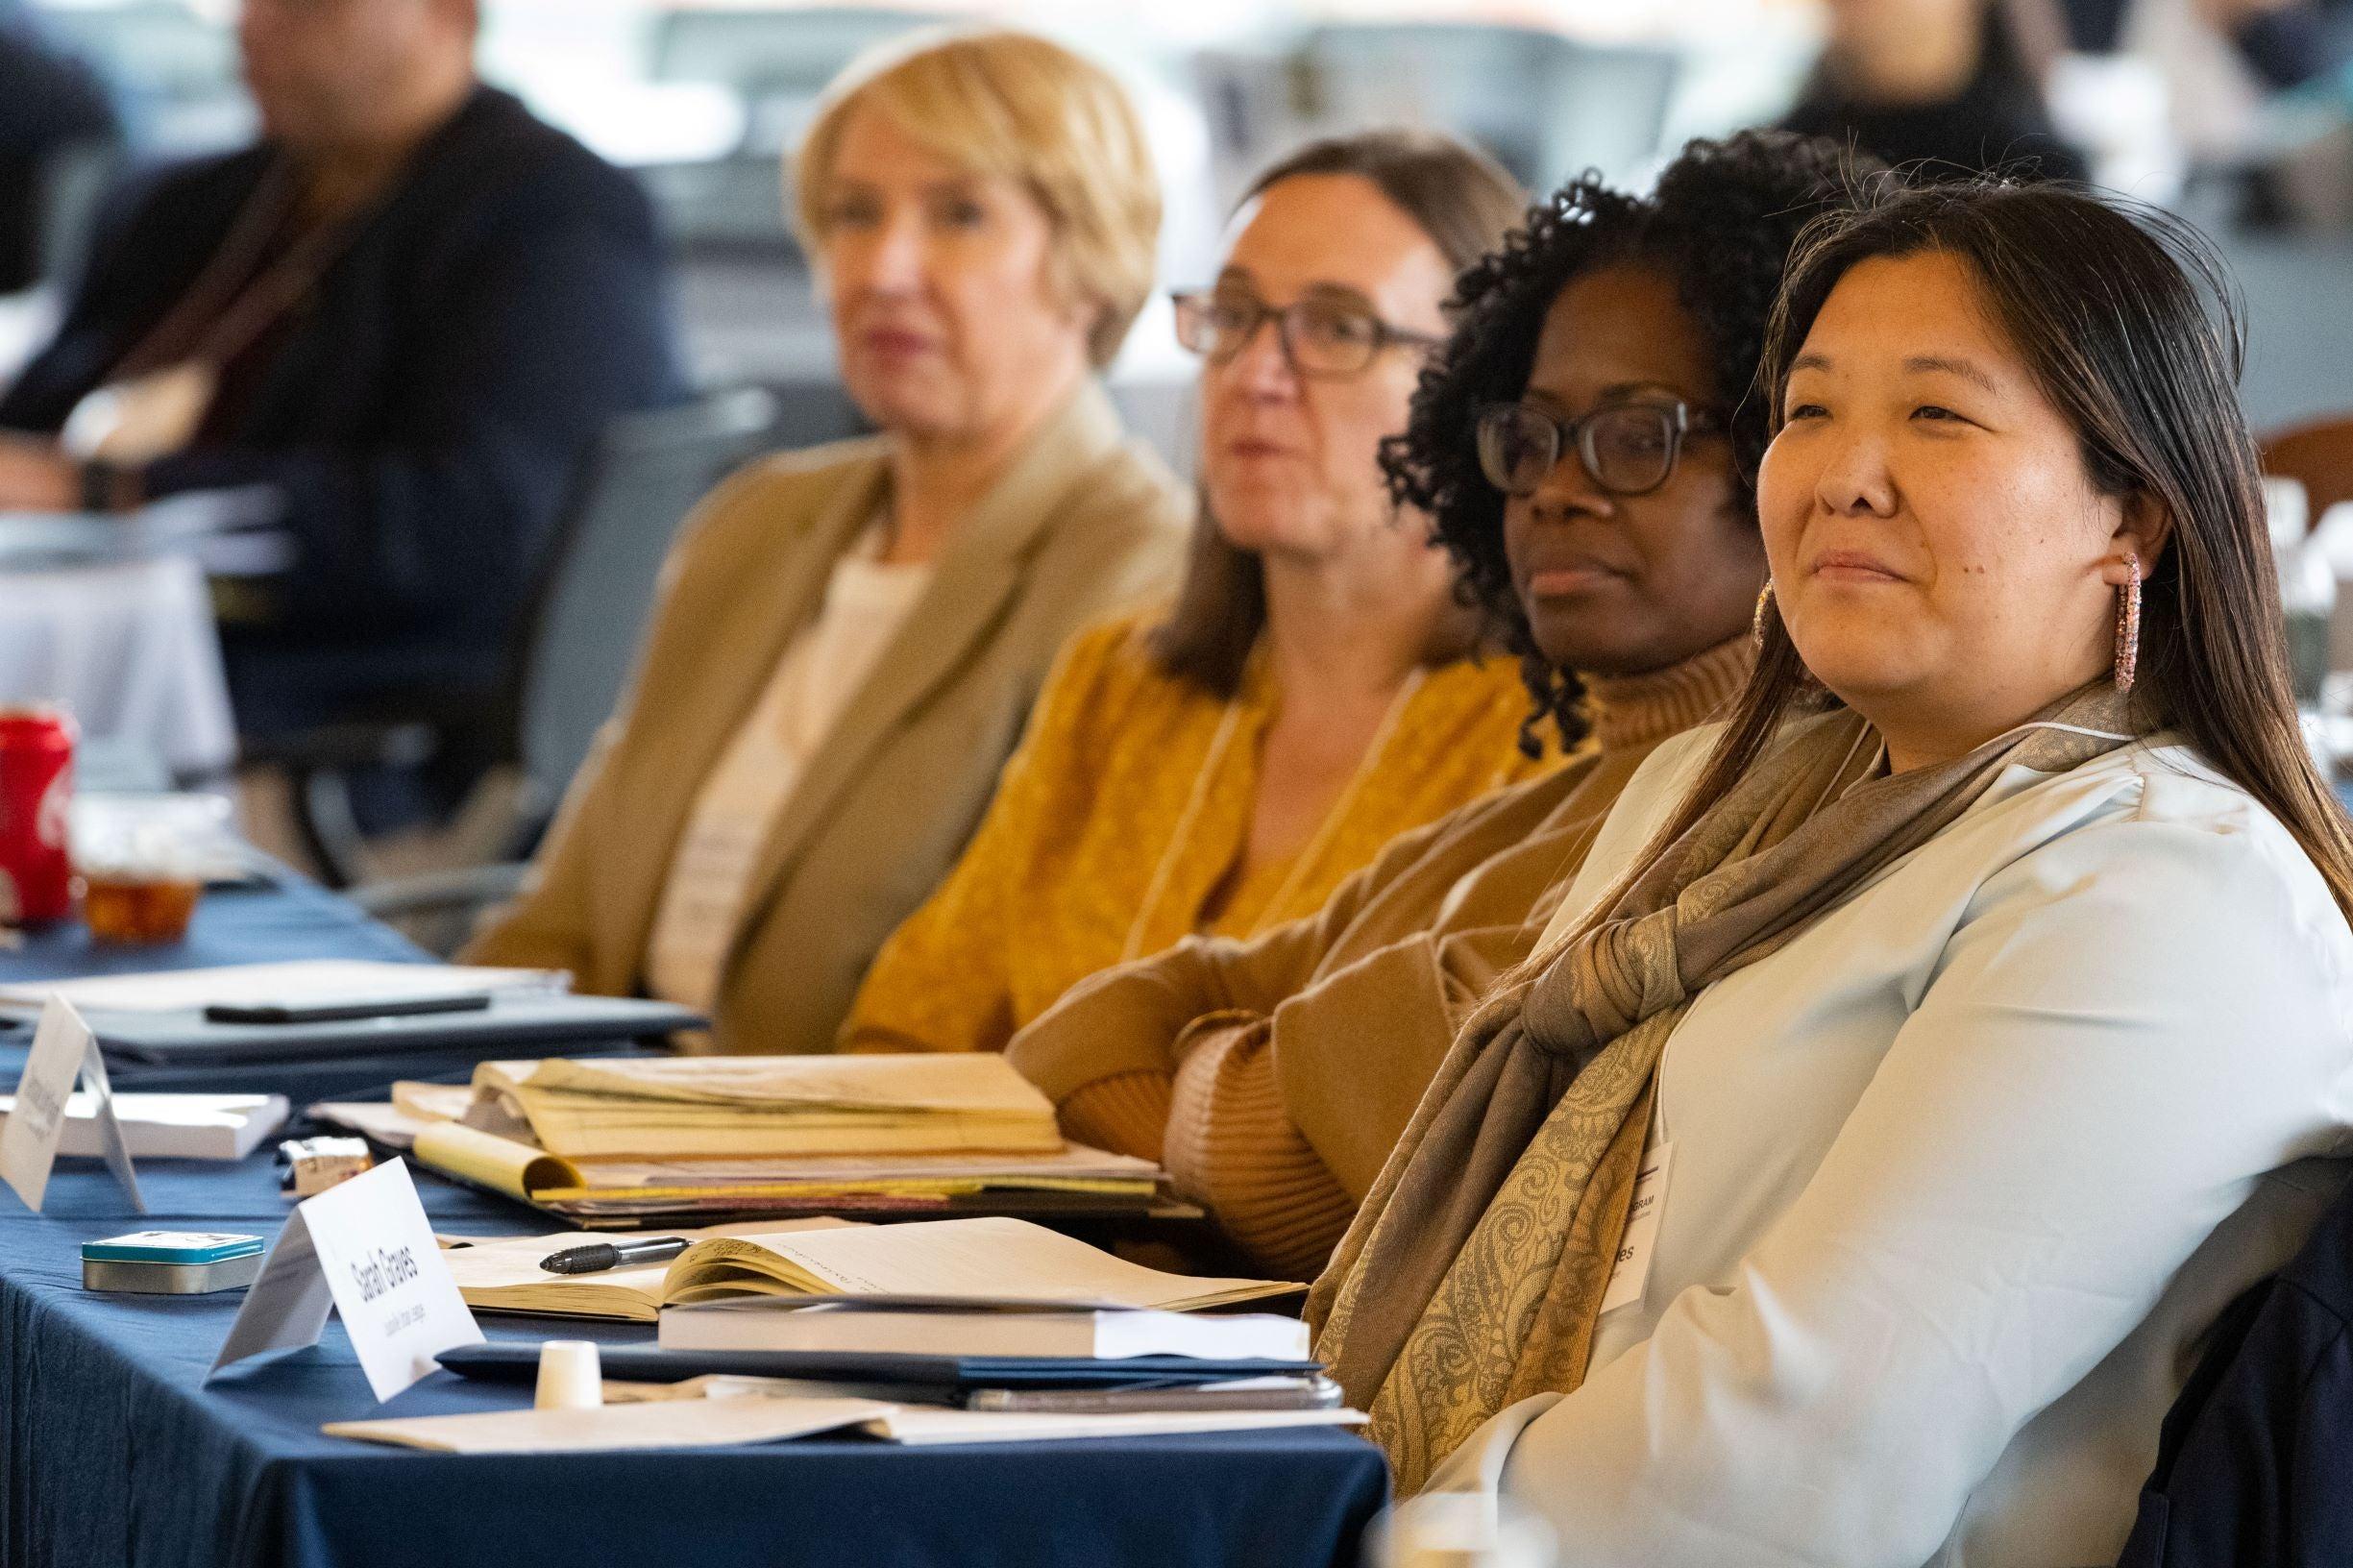 New Strategies participants